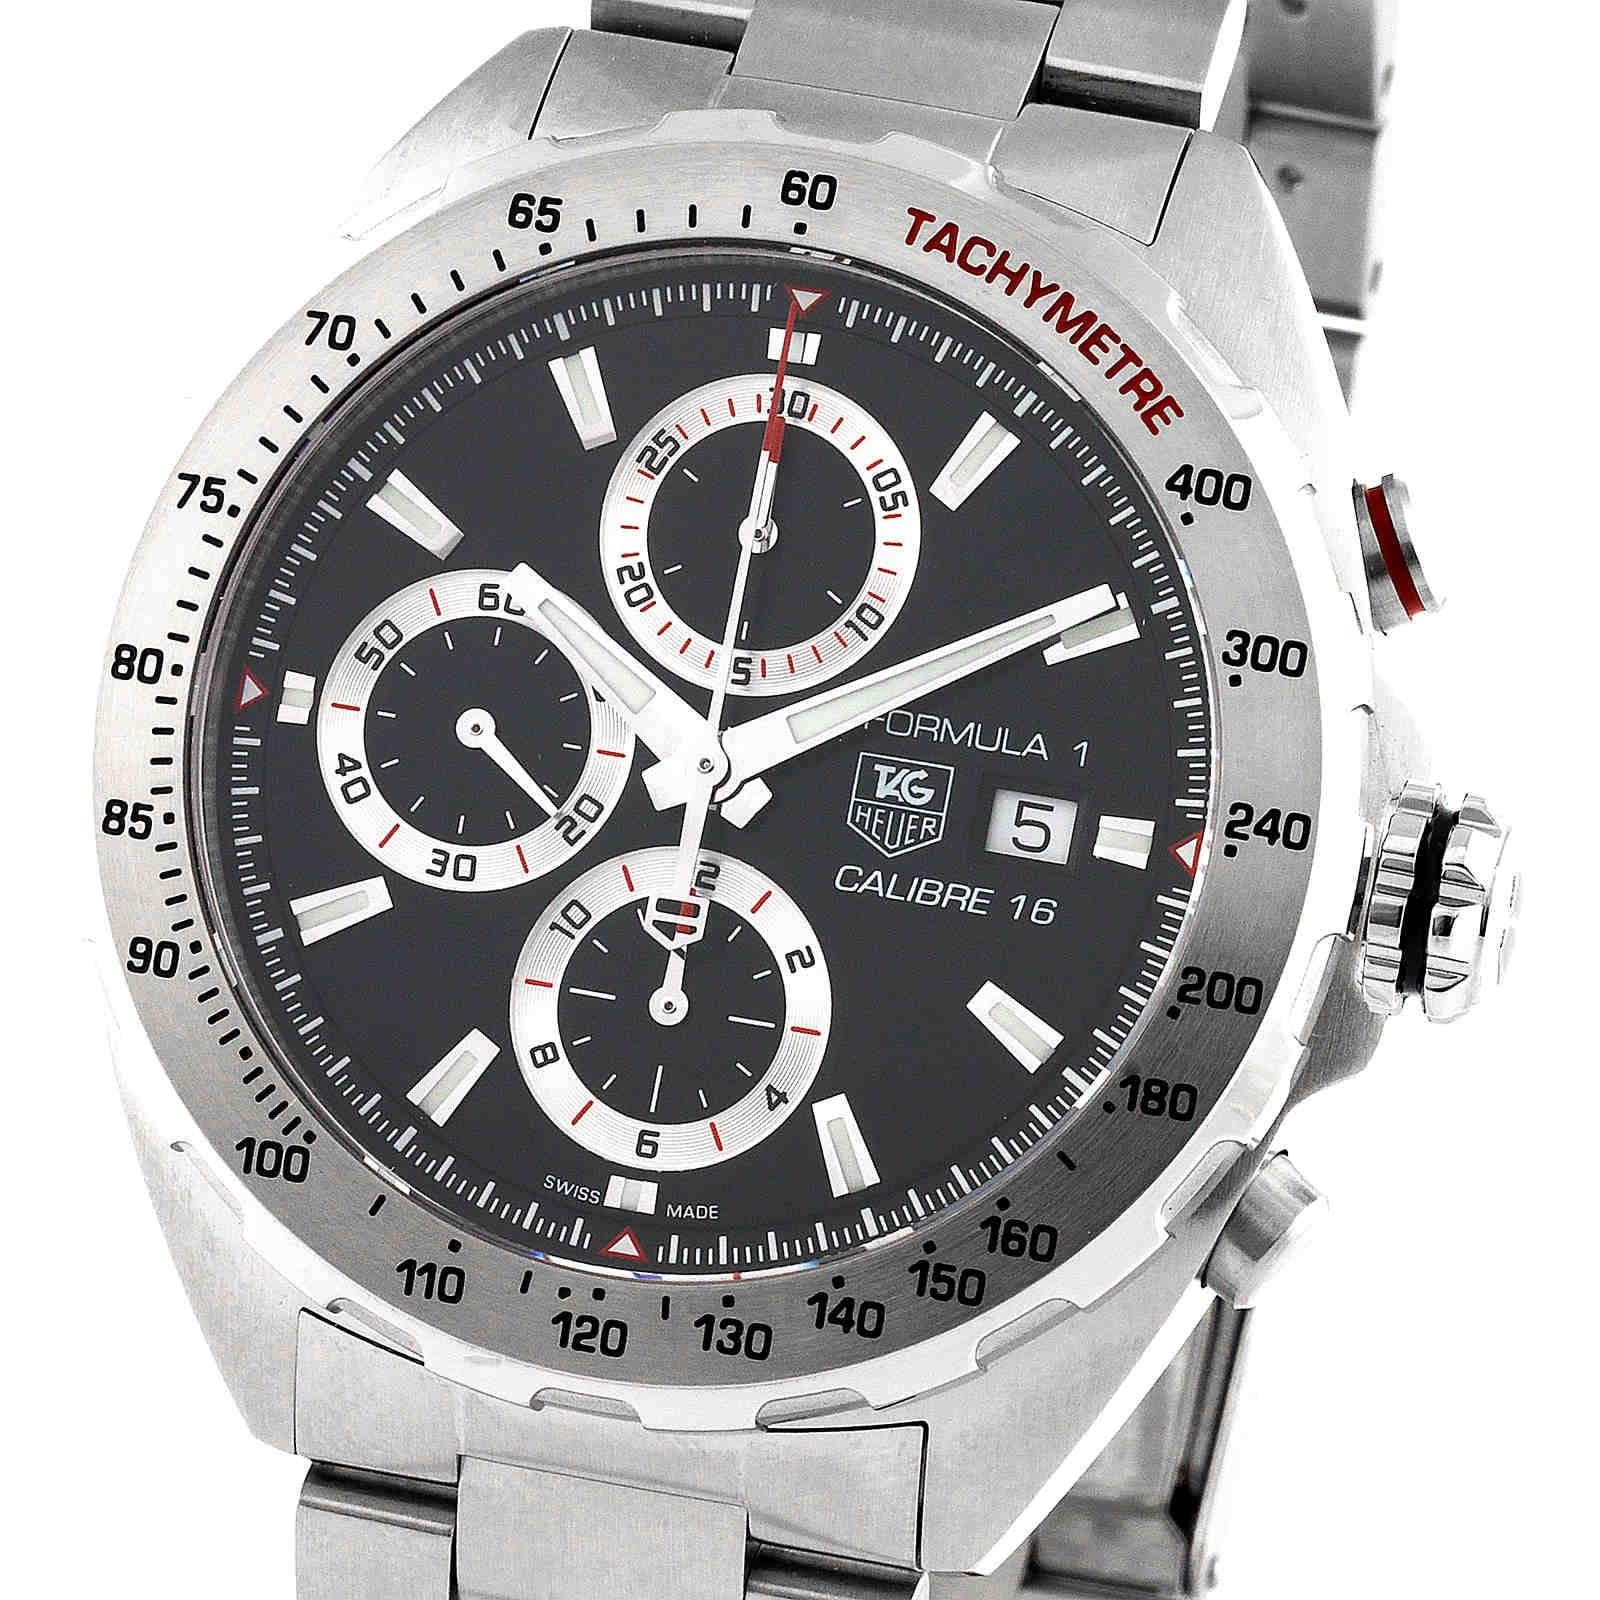 TAG Heuer Formula 1 Calibre 16 41mm Automatic Chronograph Mens Watch